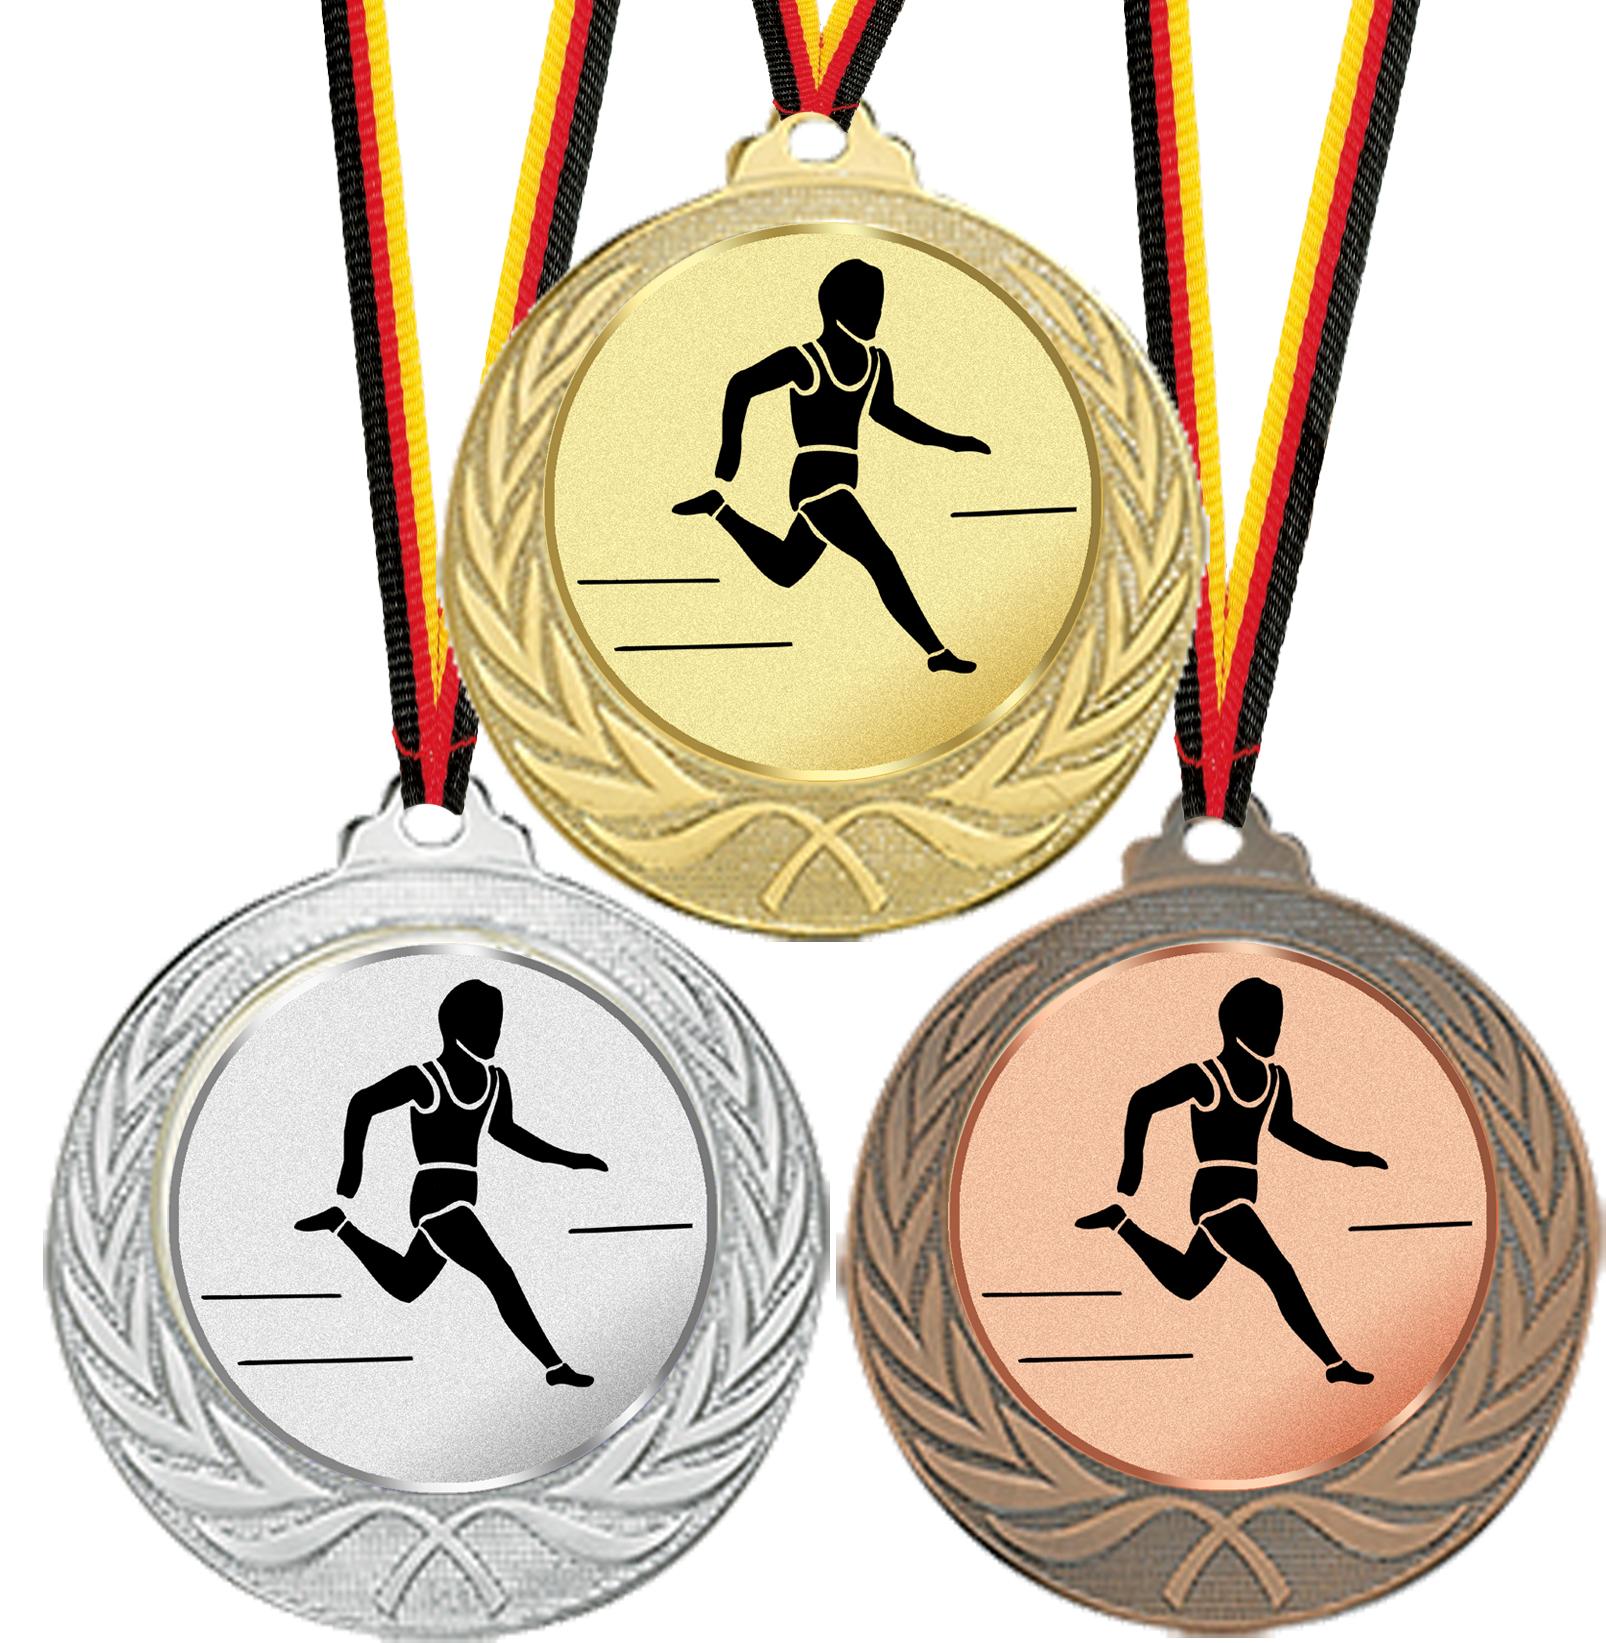 Medaille für alle Sportarten 70mmØ Medaillen Standardmedaillen